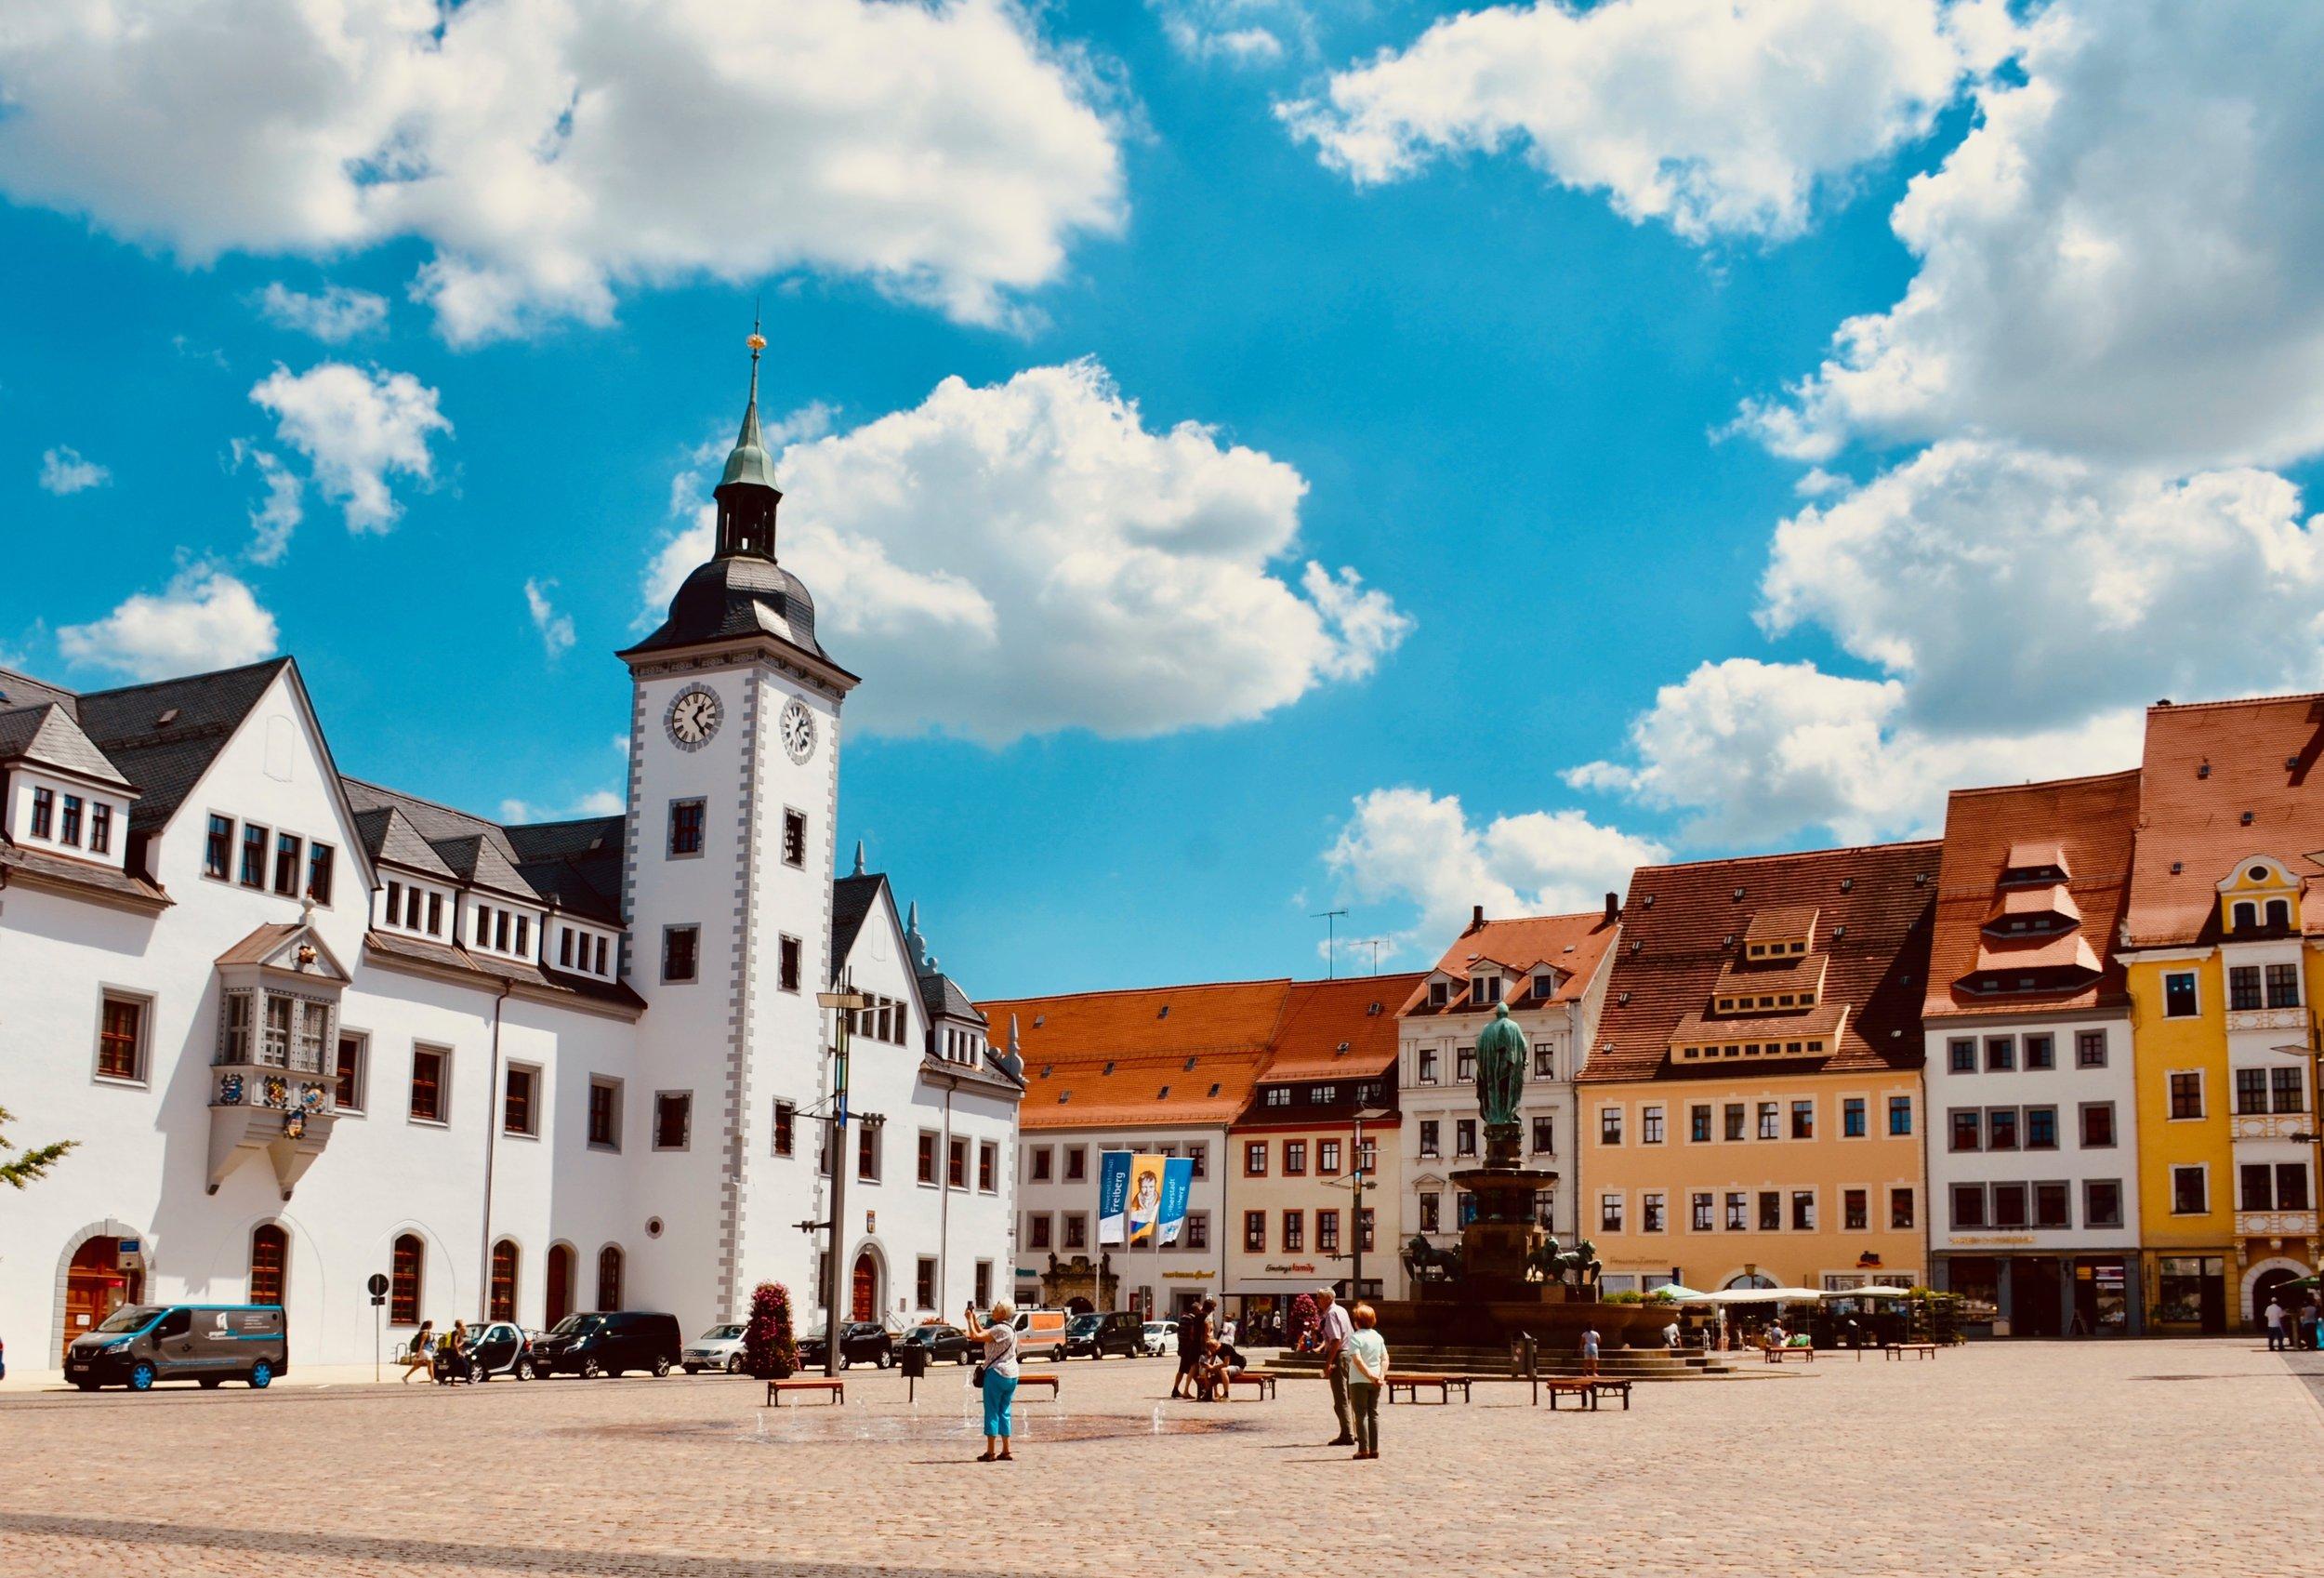 Freiberg, Germany.